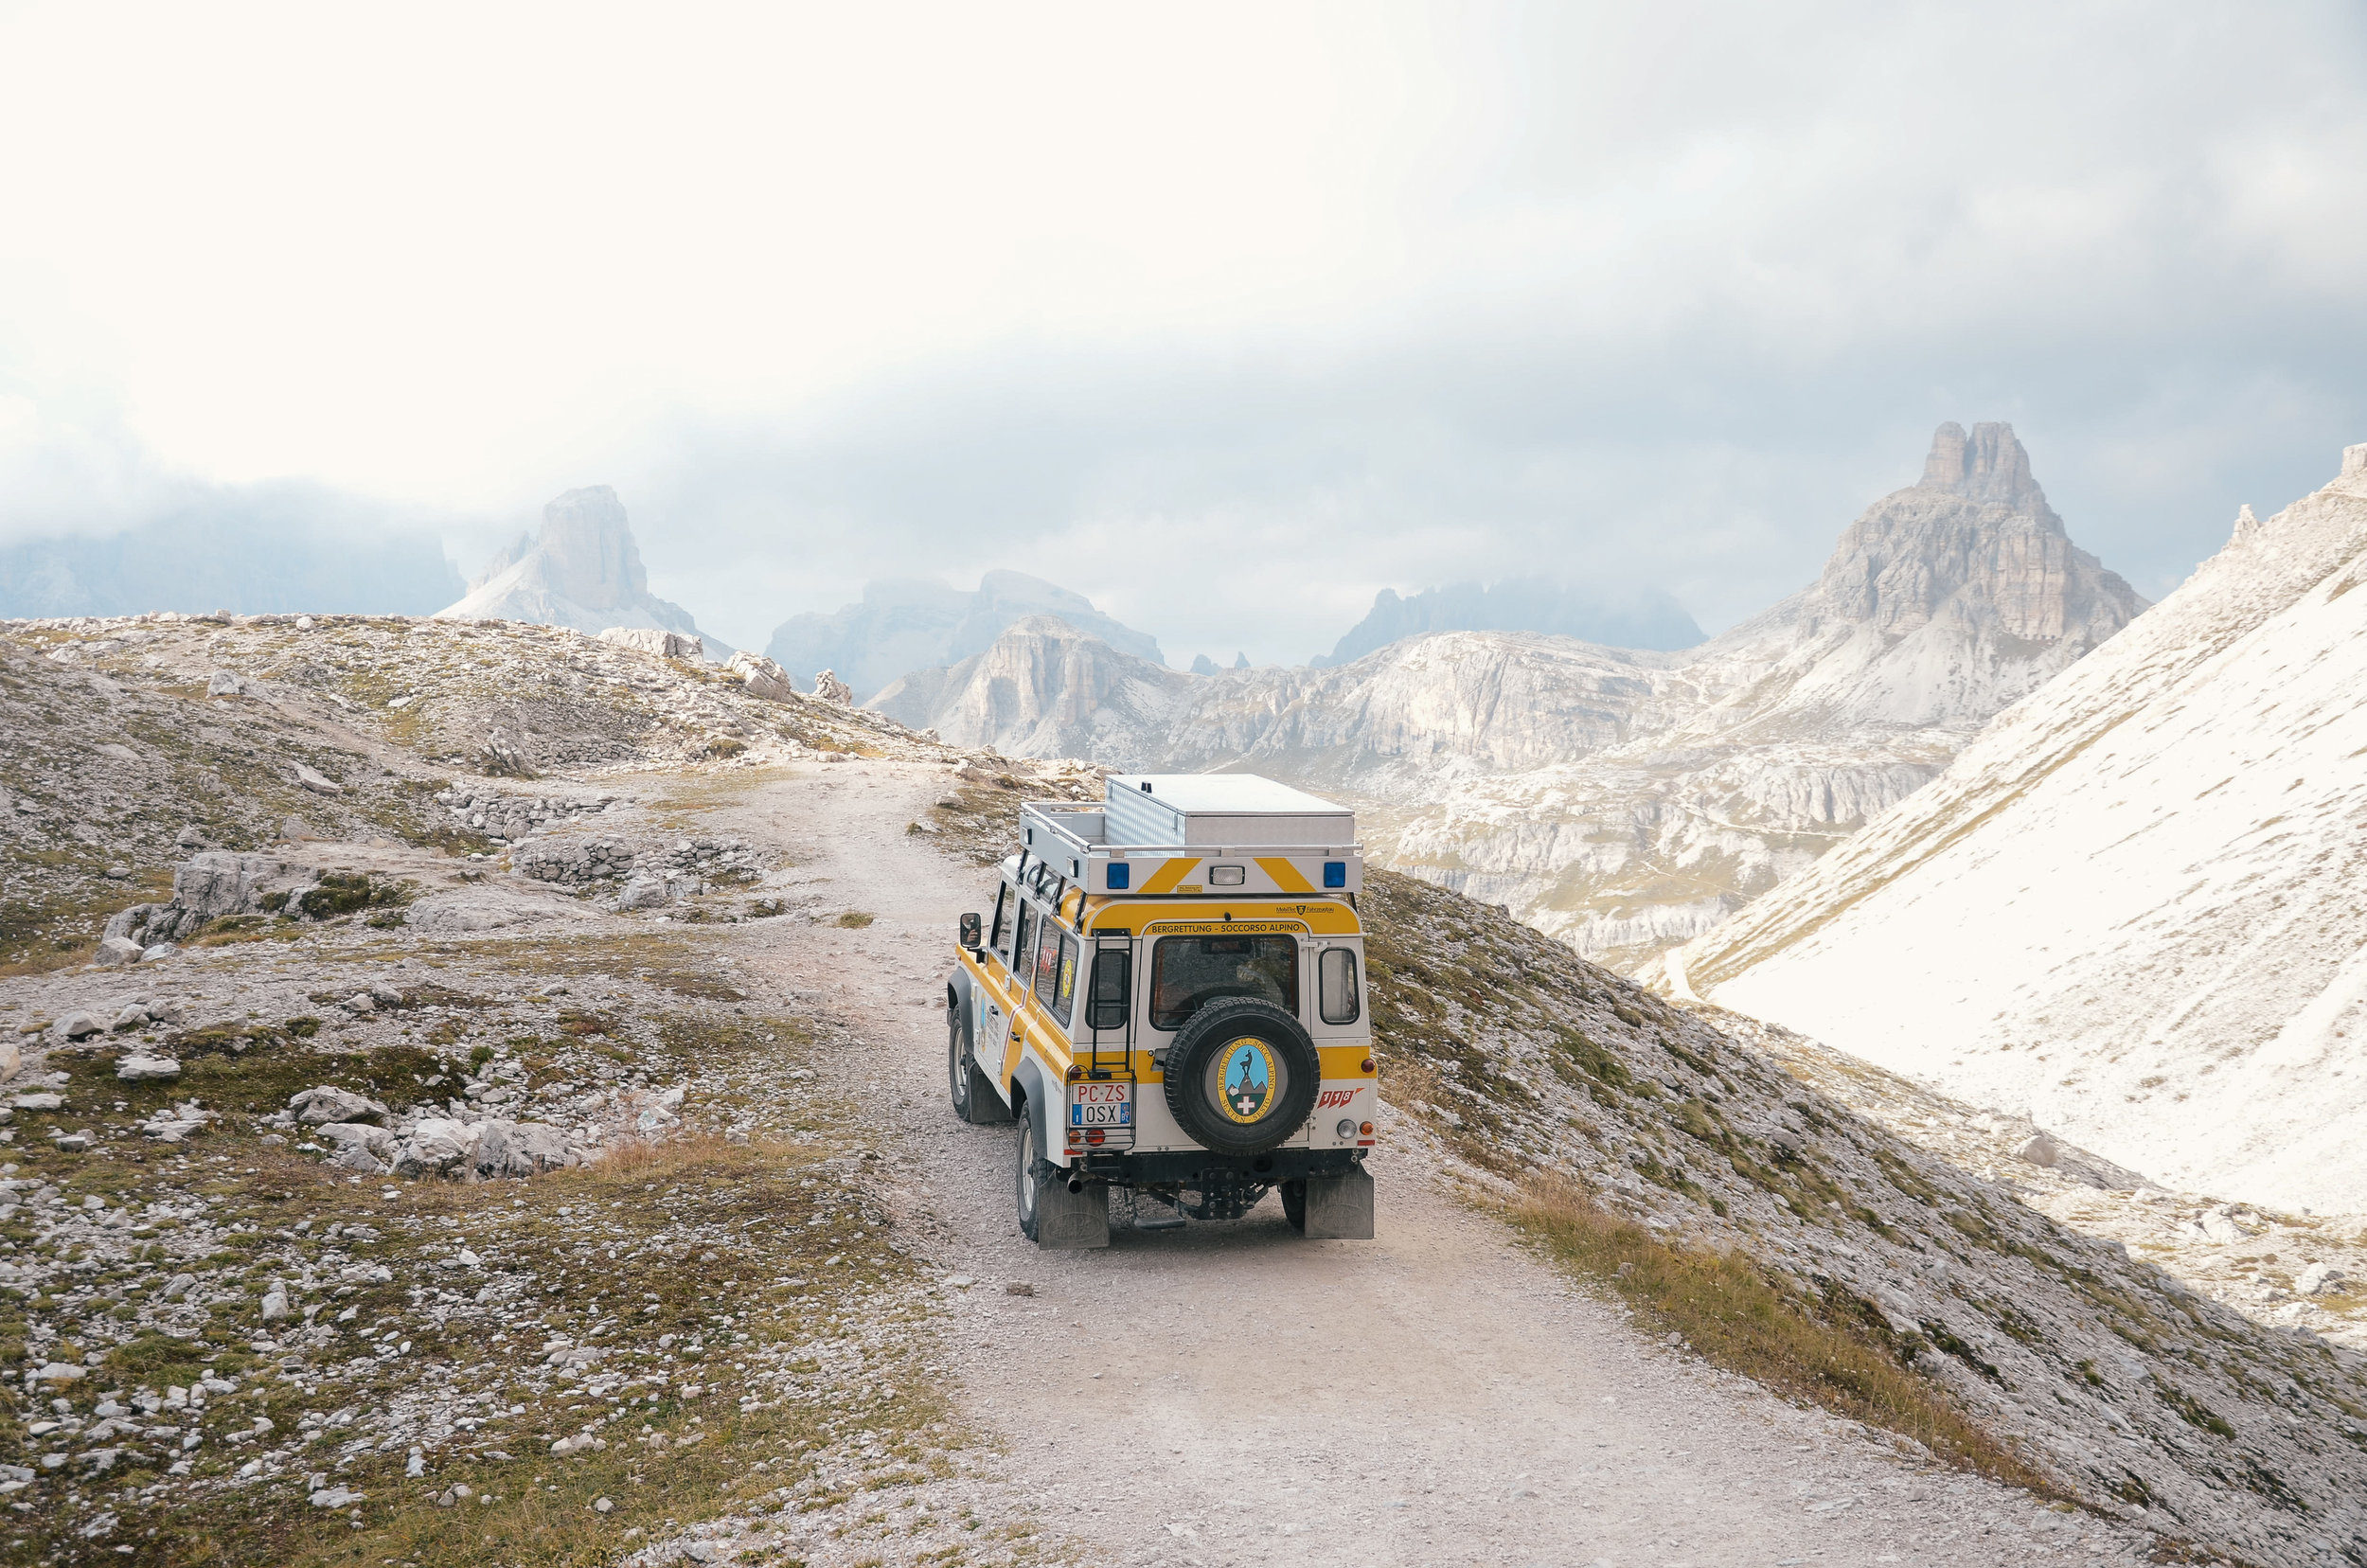 adventure-in-italy-3-hikes-dolomites-hiking-travel-blog-tyrol-15.jpg